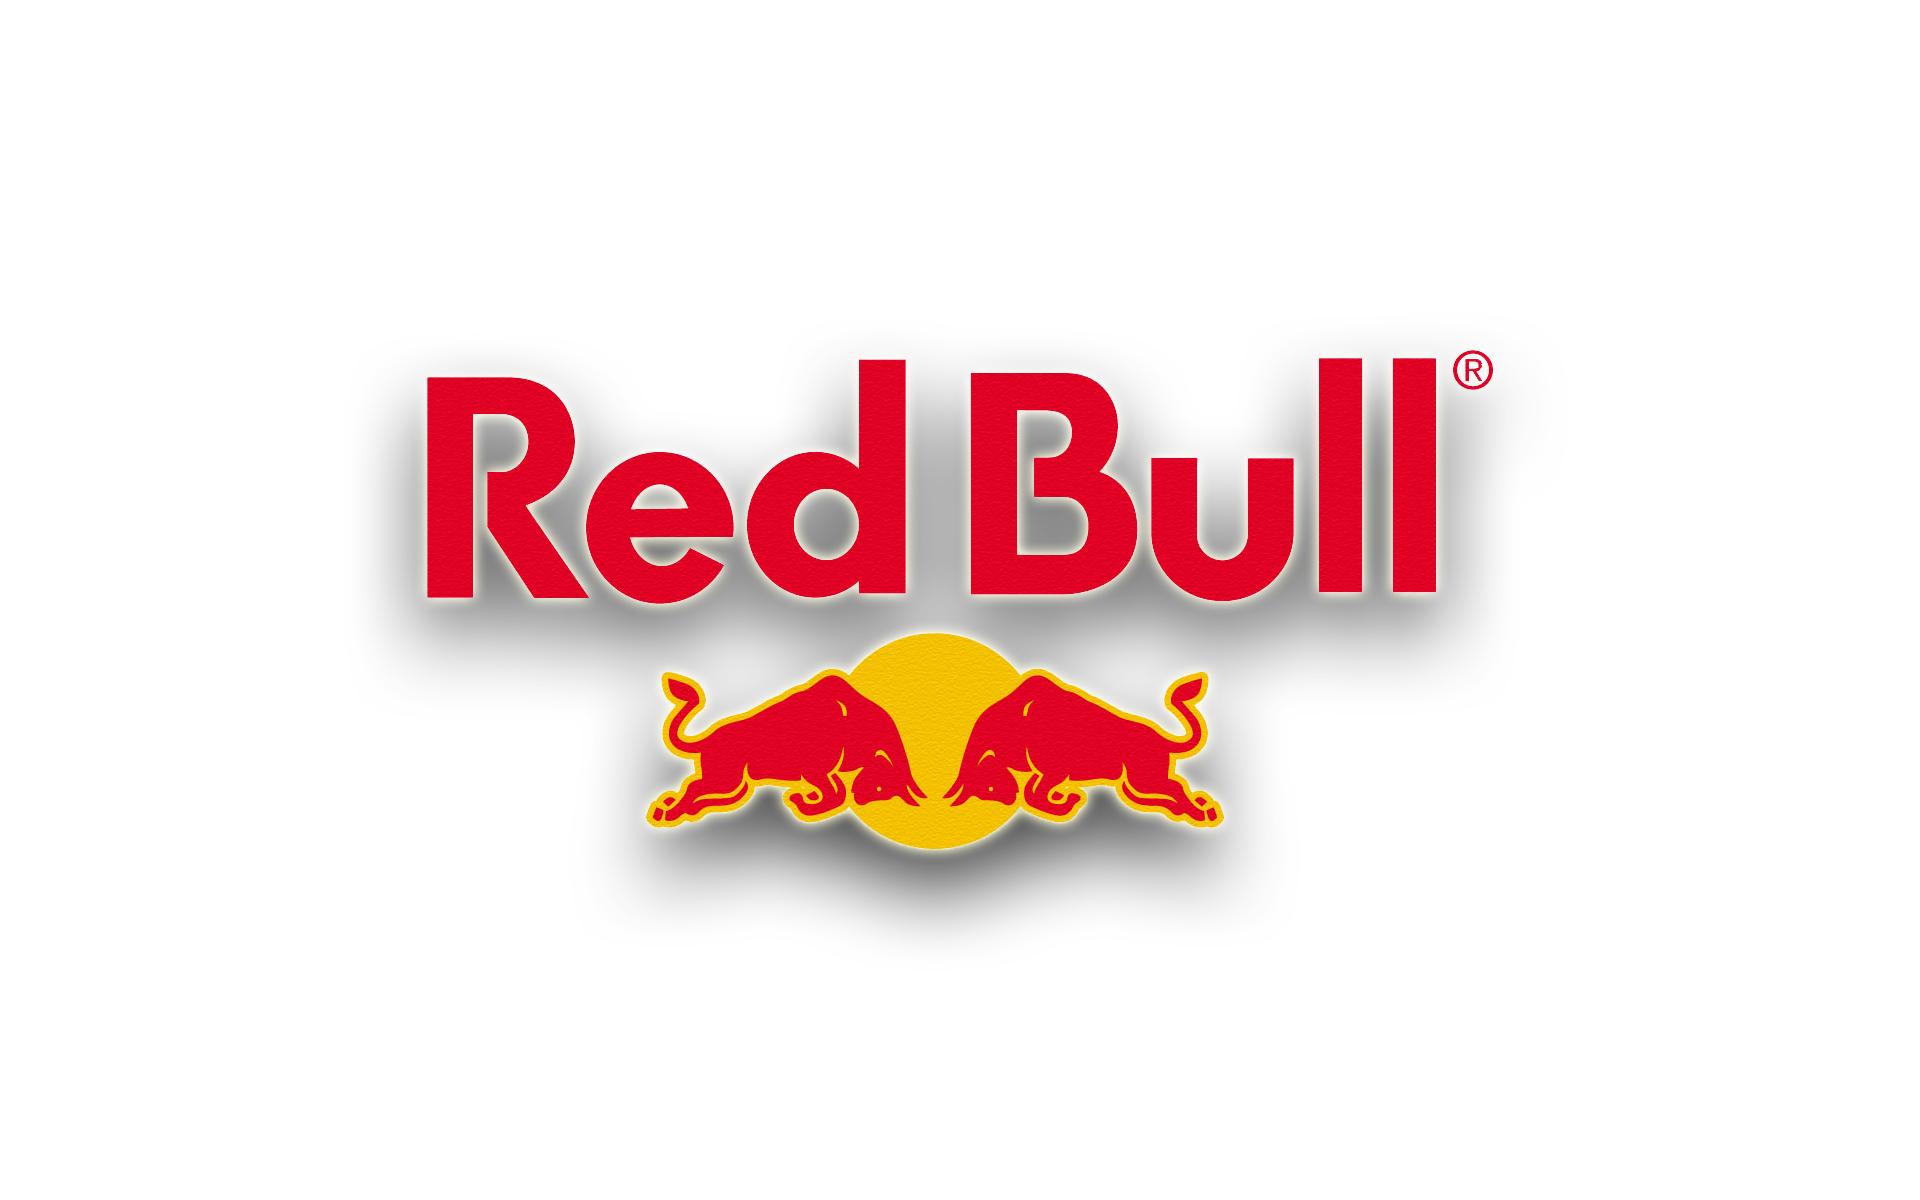 Red Bull Wallpaper Hd Iphone Red Bull Logo Logo Brands For Free Hd 3d